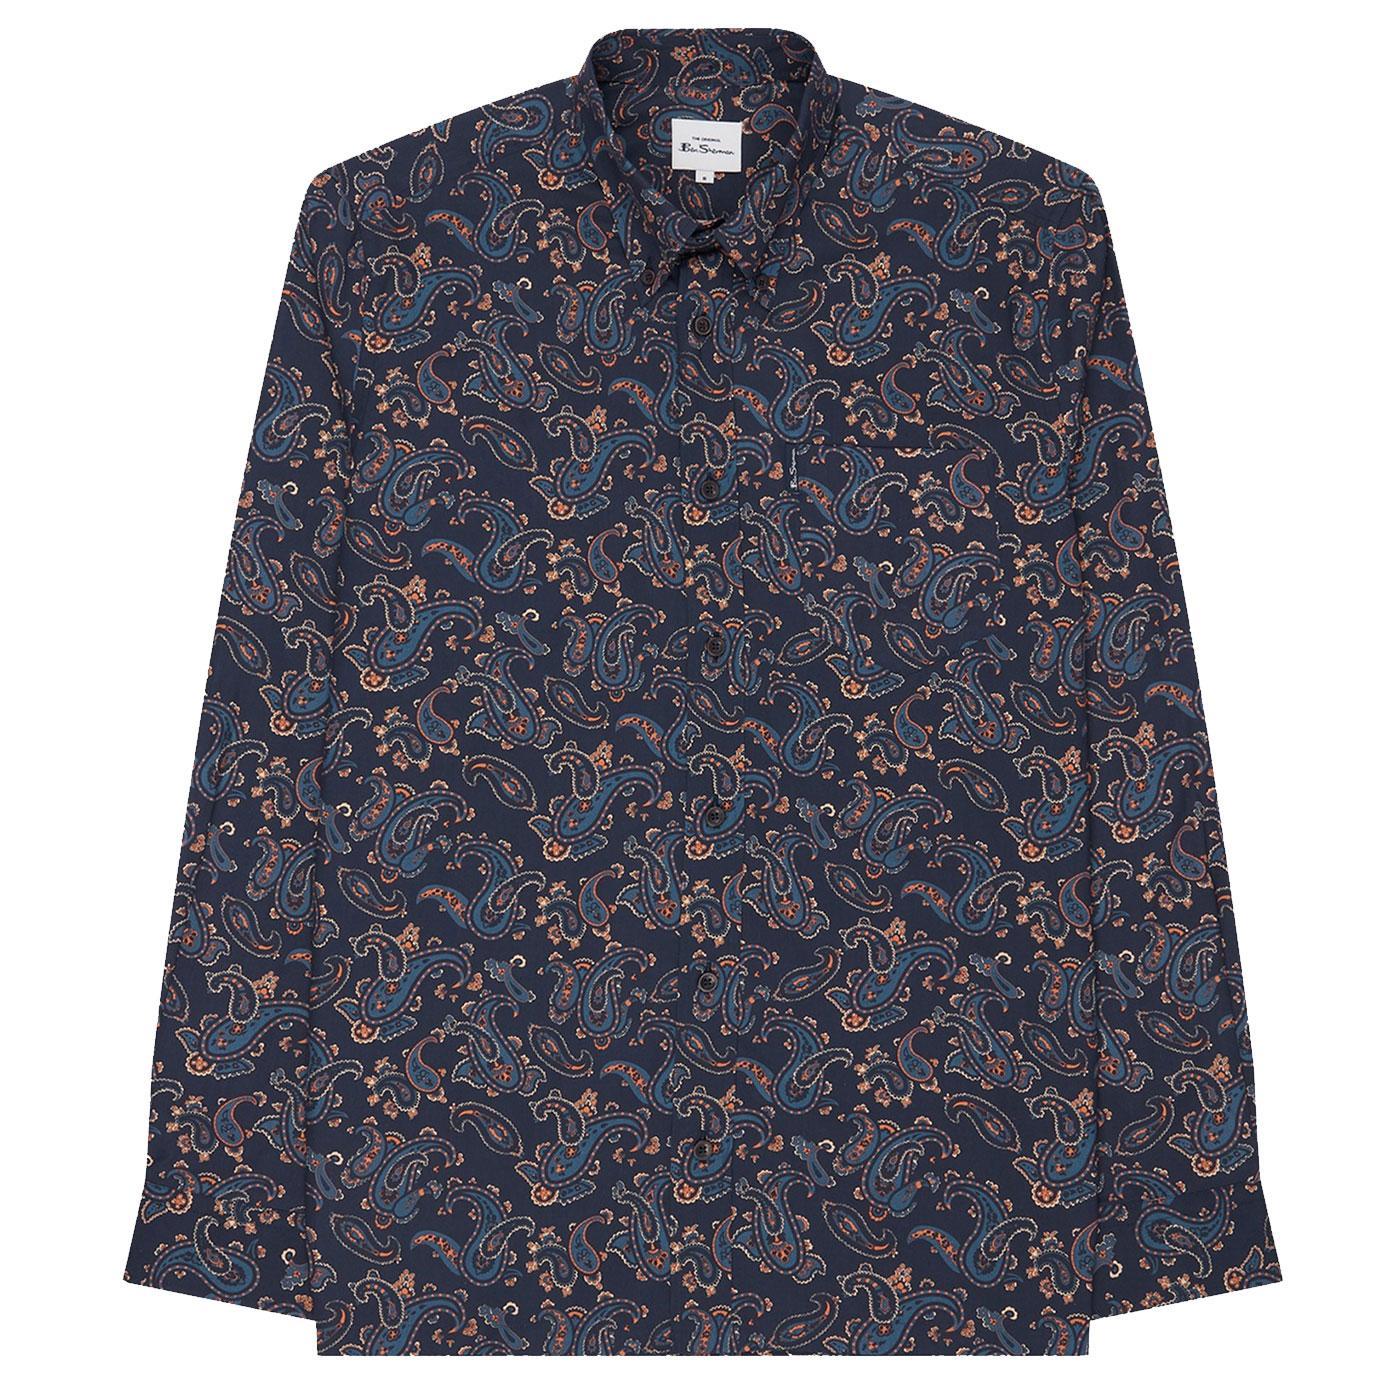 BEN SHERMAN 60's Mod Large Paisley Shirt - Marine